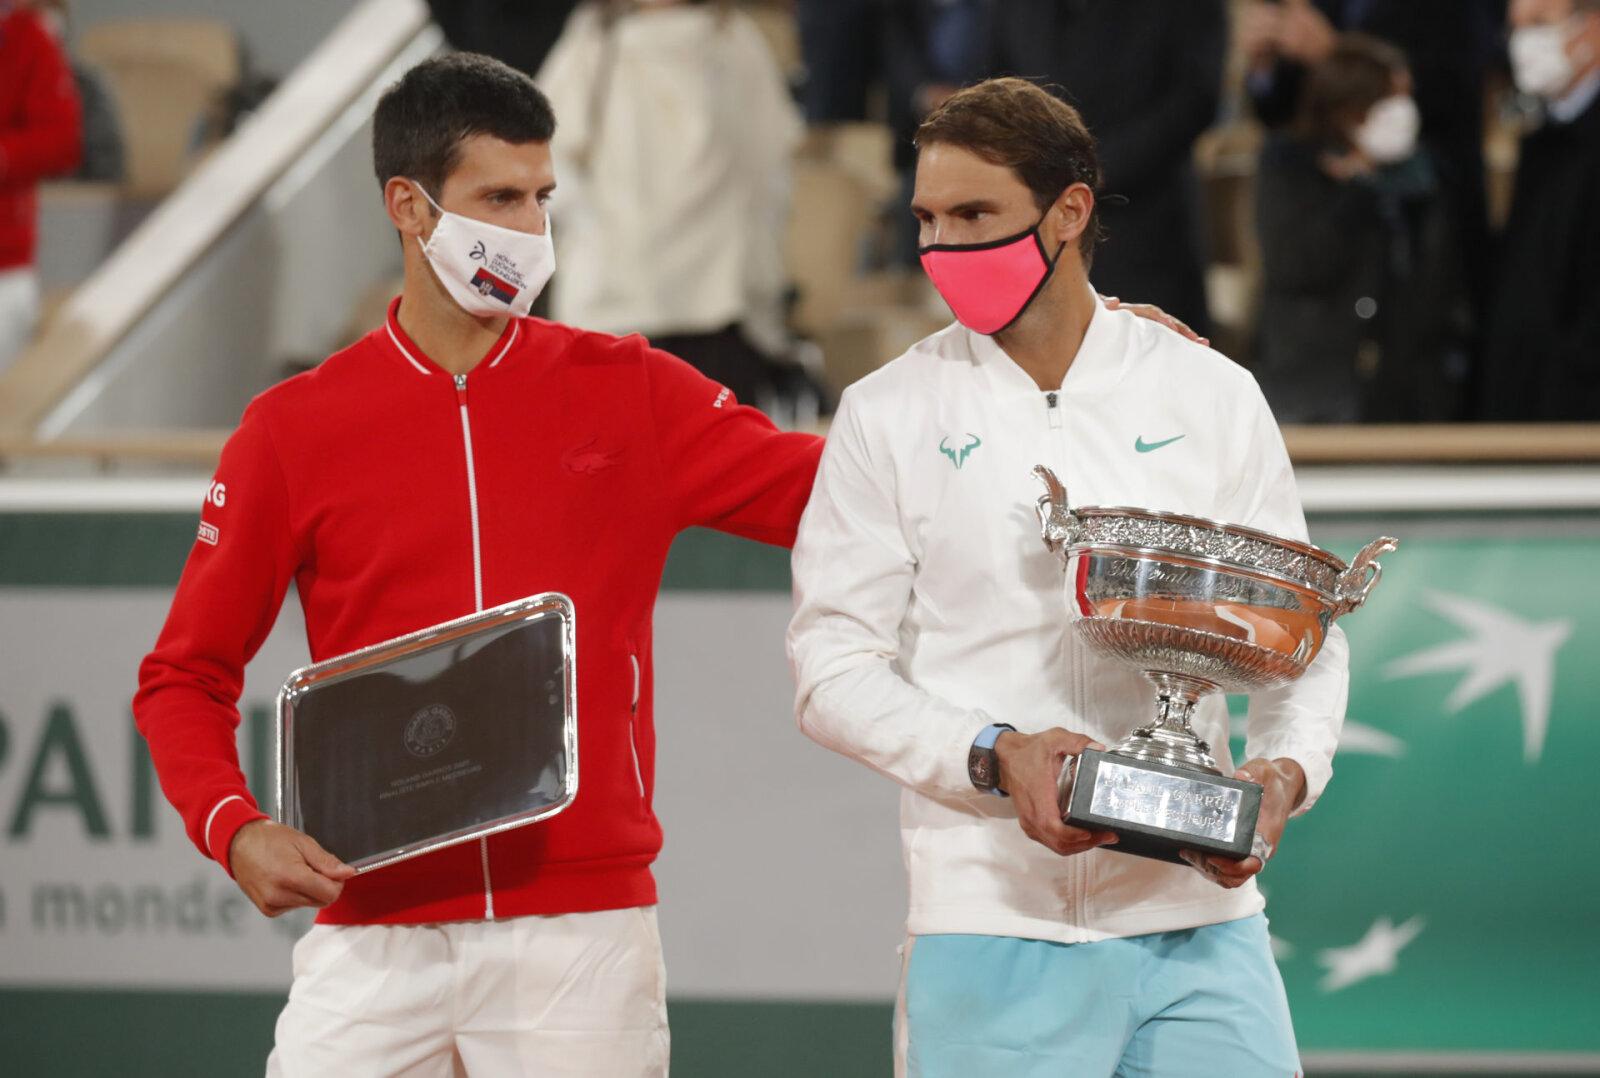 Rome Open 2021: Rafael Nadal vs. Novak Djokovic Tennis Pick and Prediction